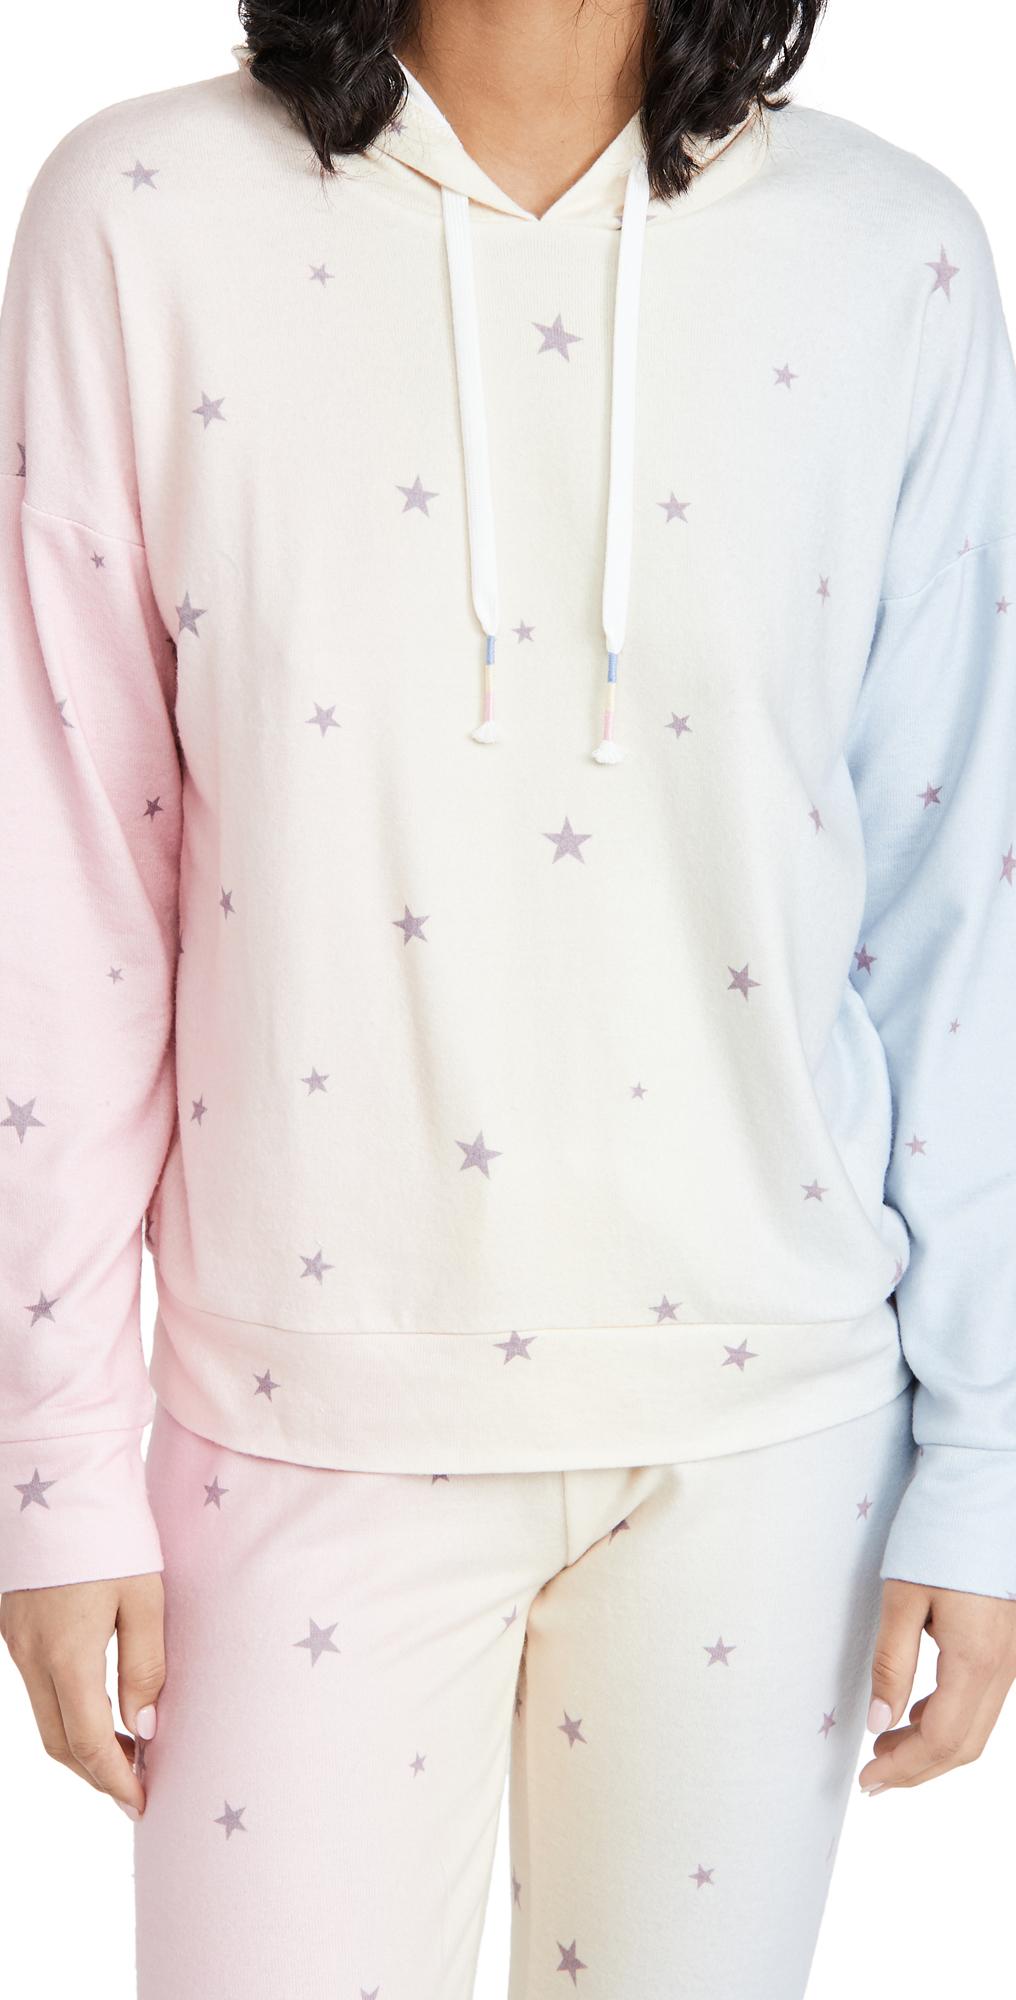 PJ Salvage Peachy Party Sweatshirt